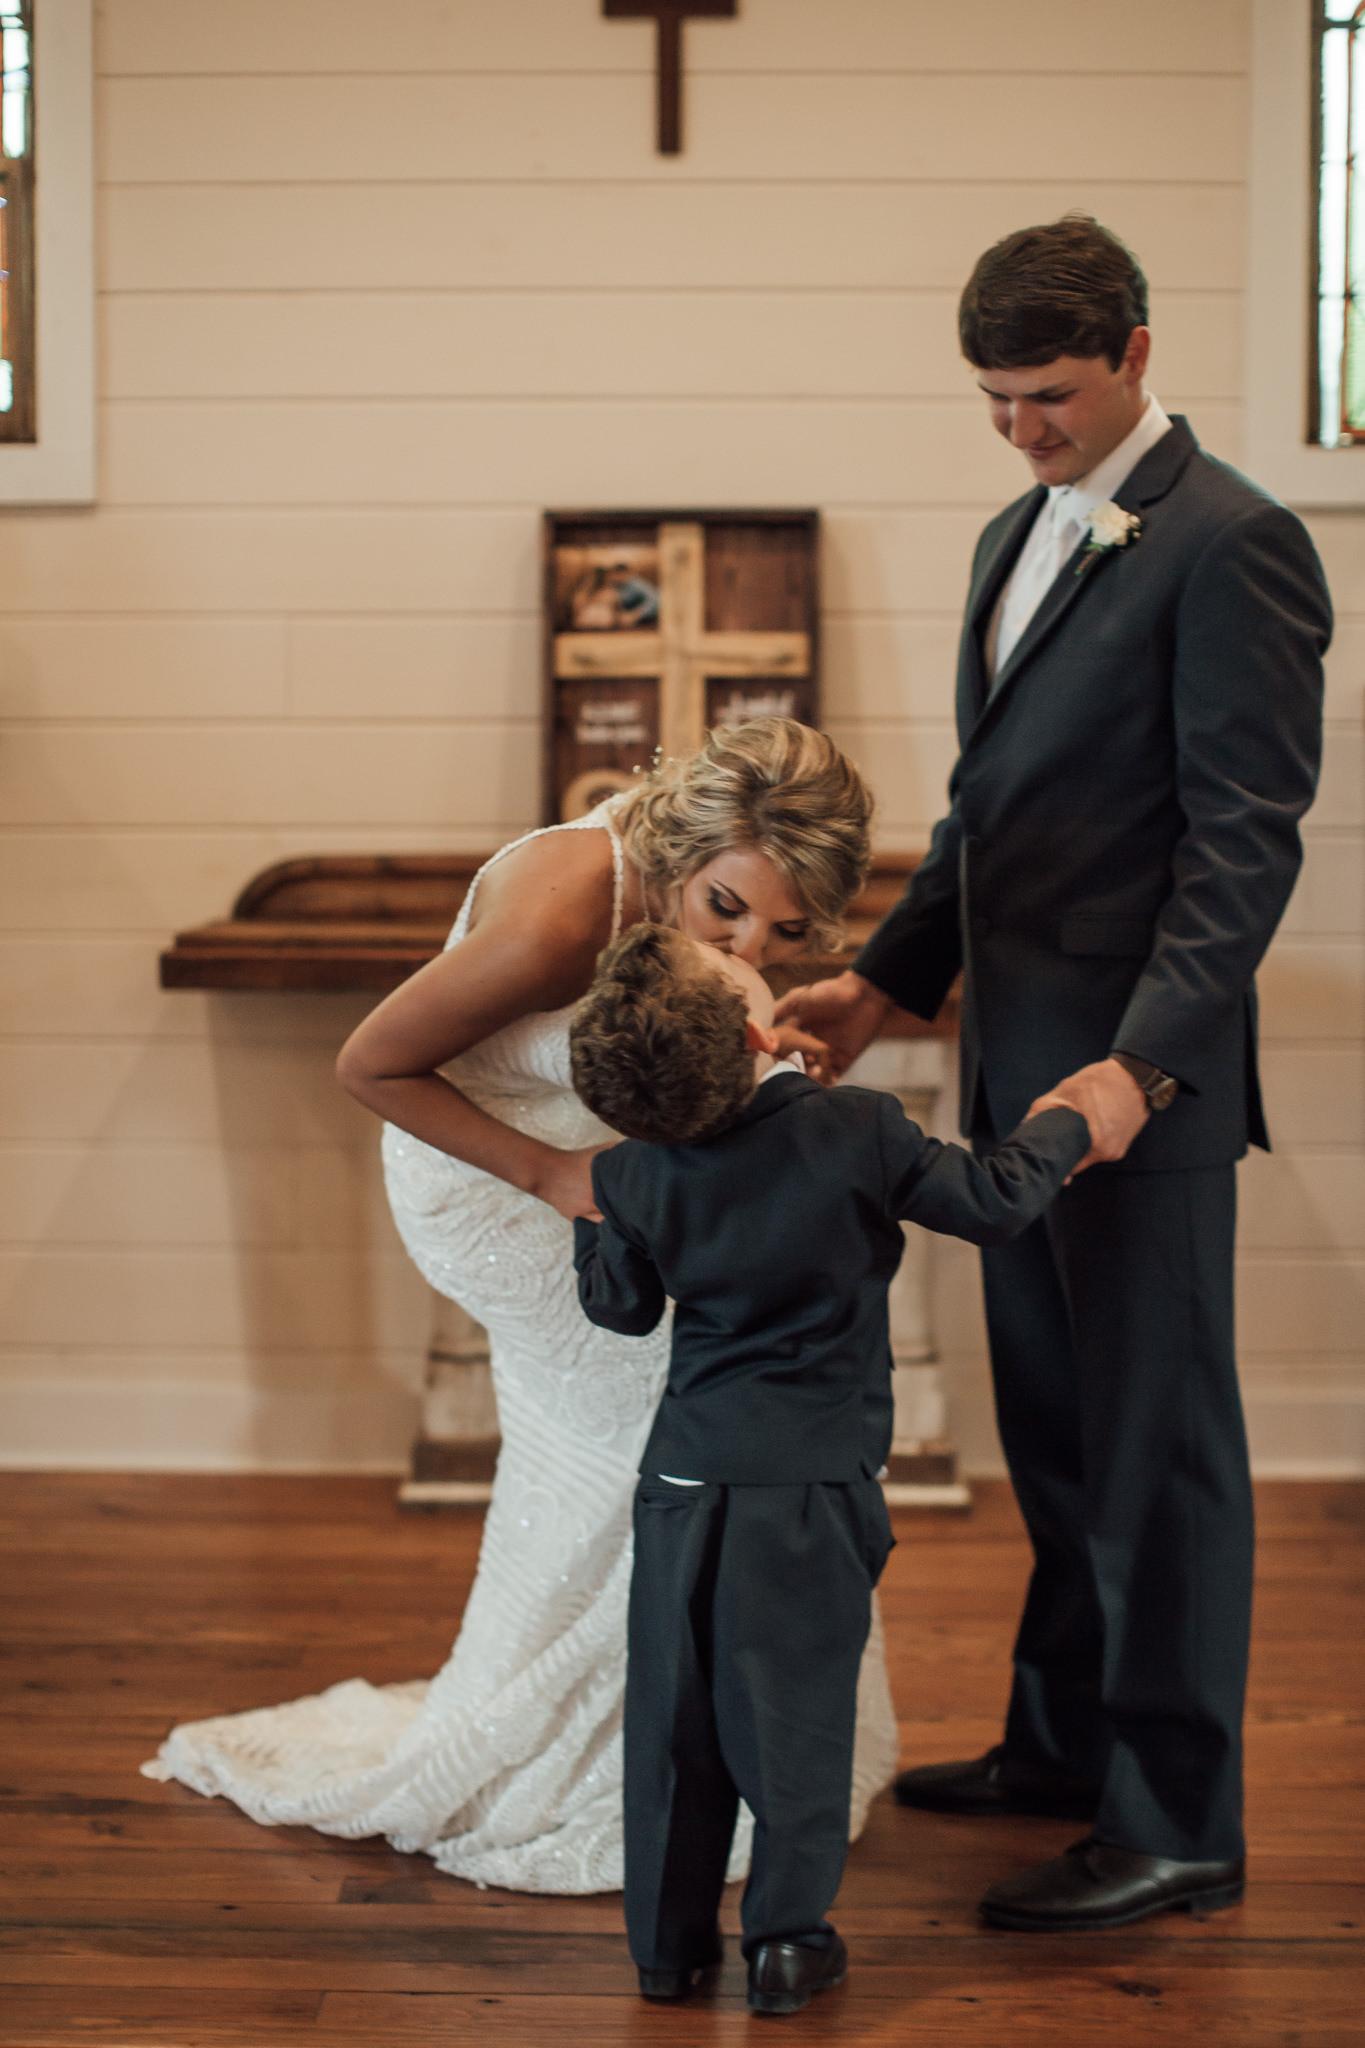 cassie-cook-photography-memphis-wedding-photographer-hedge-farm-wedding-venue-230.jpg